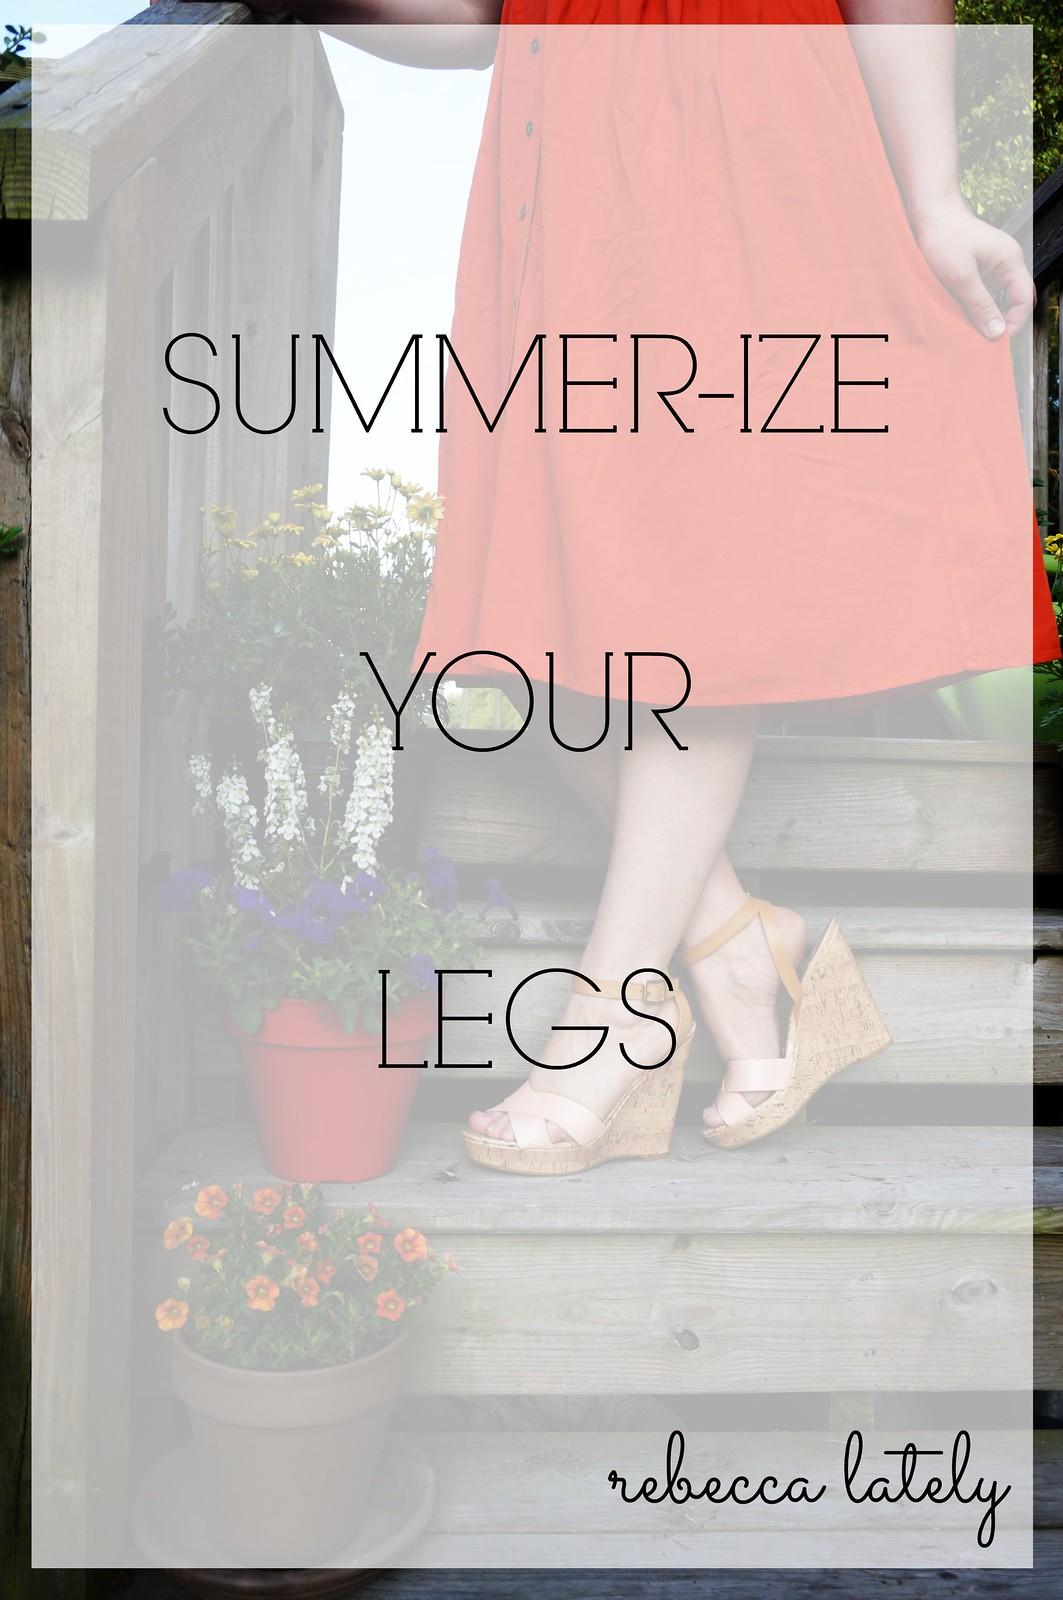 Summerize Your Legs 2